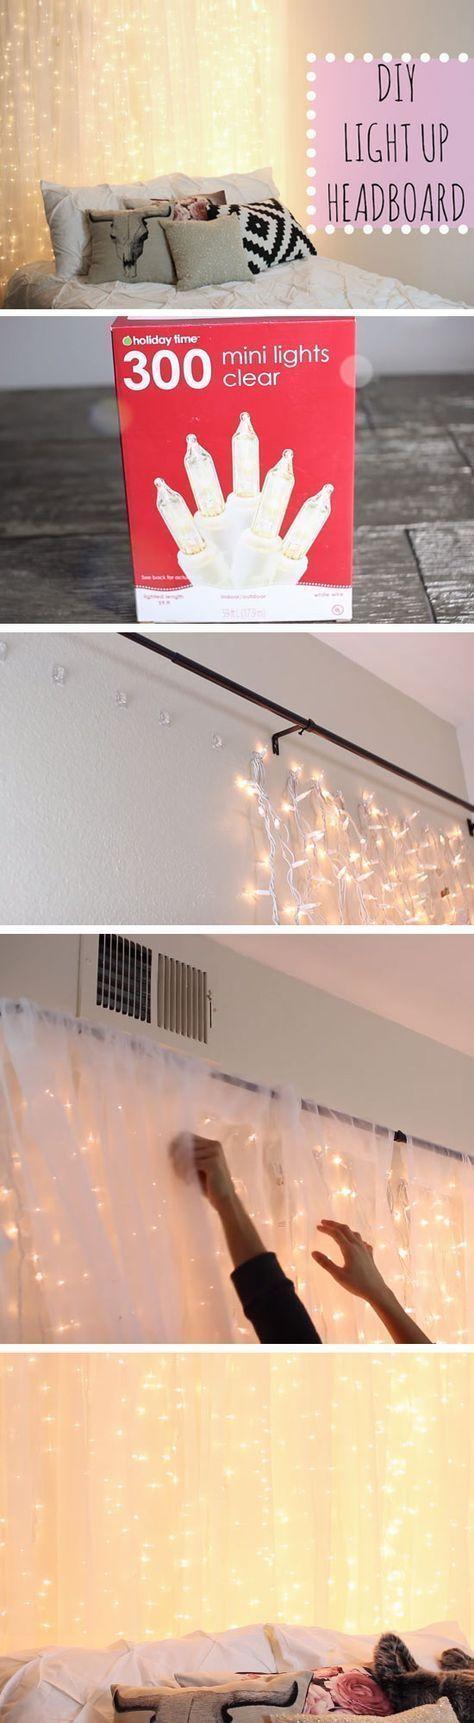 18 DIY Tumblr Dorm Room Ideas for Girls